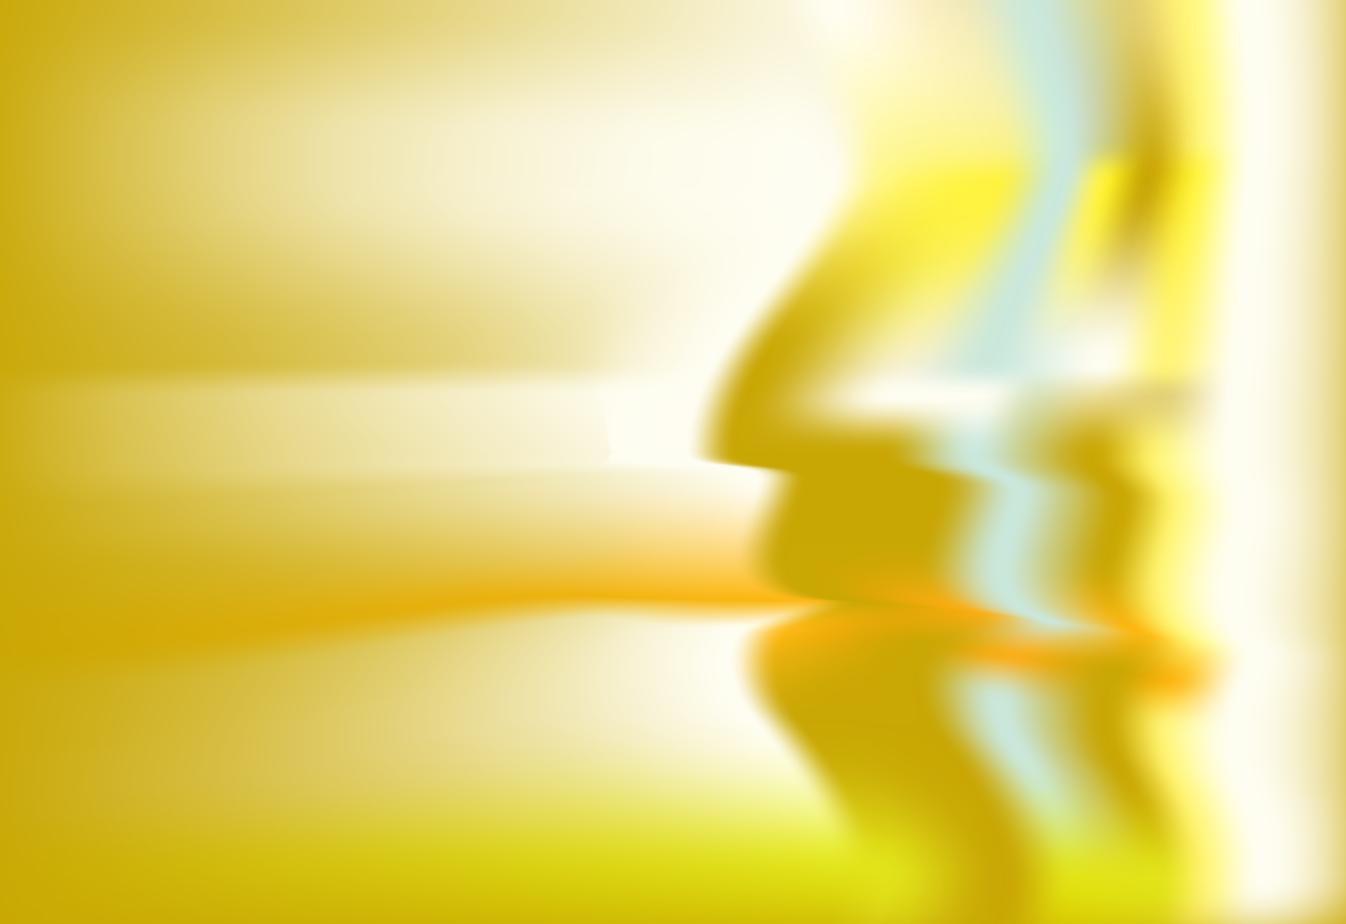 hominum_digital_art_ron_labryzz_rlart-digital-art